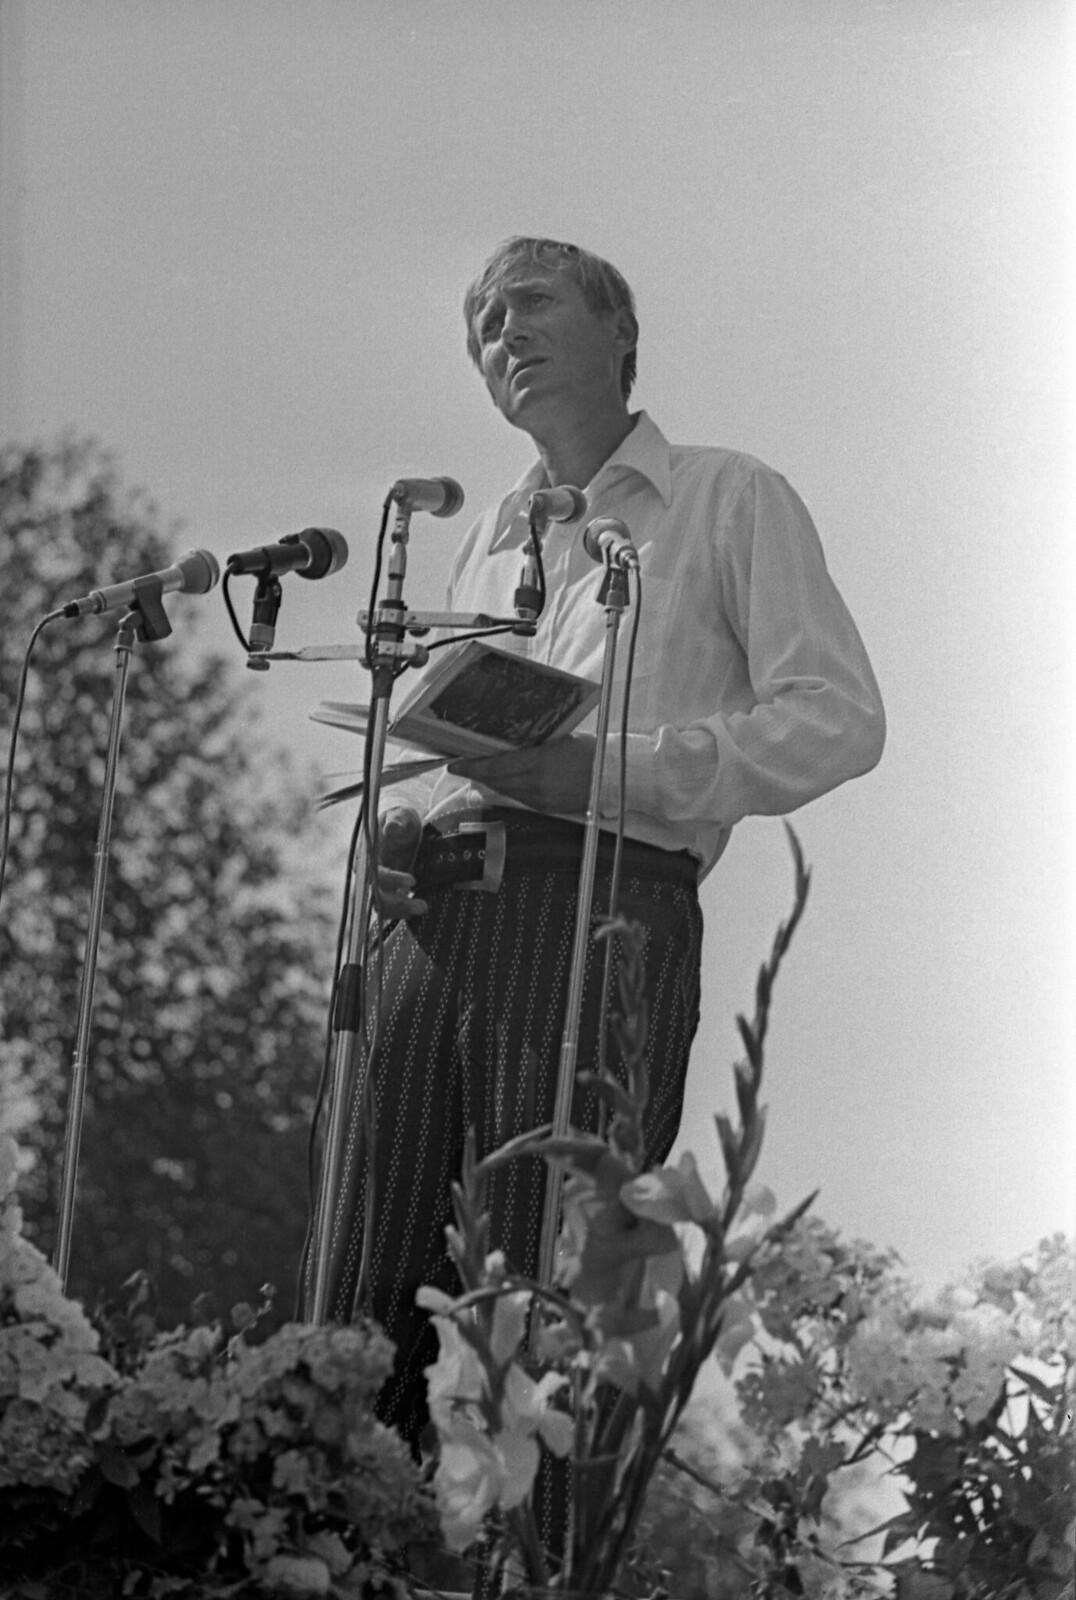 1974. Блоковский праздник в Шахматове, Поэт Евгений Евтушенко.